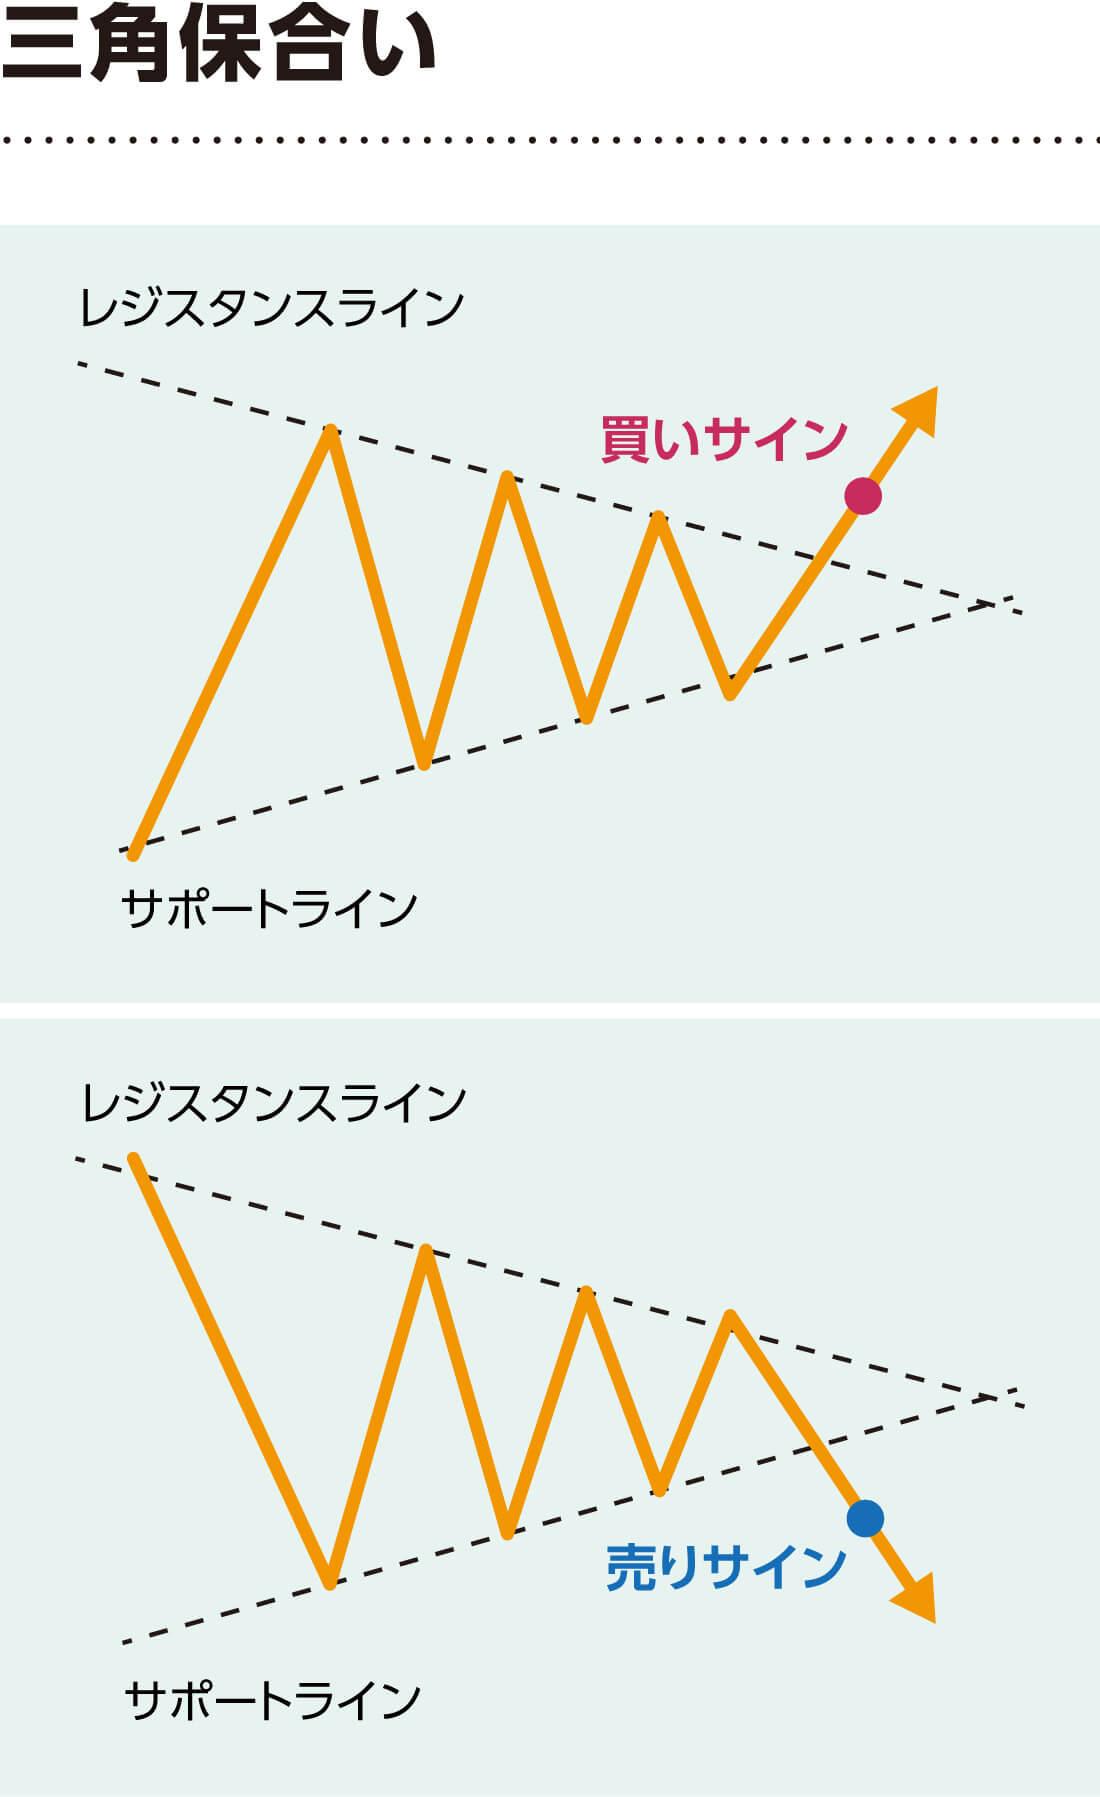 三角保合い解説図